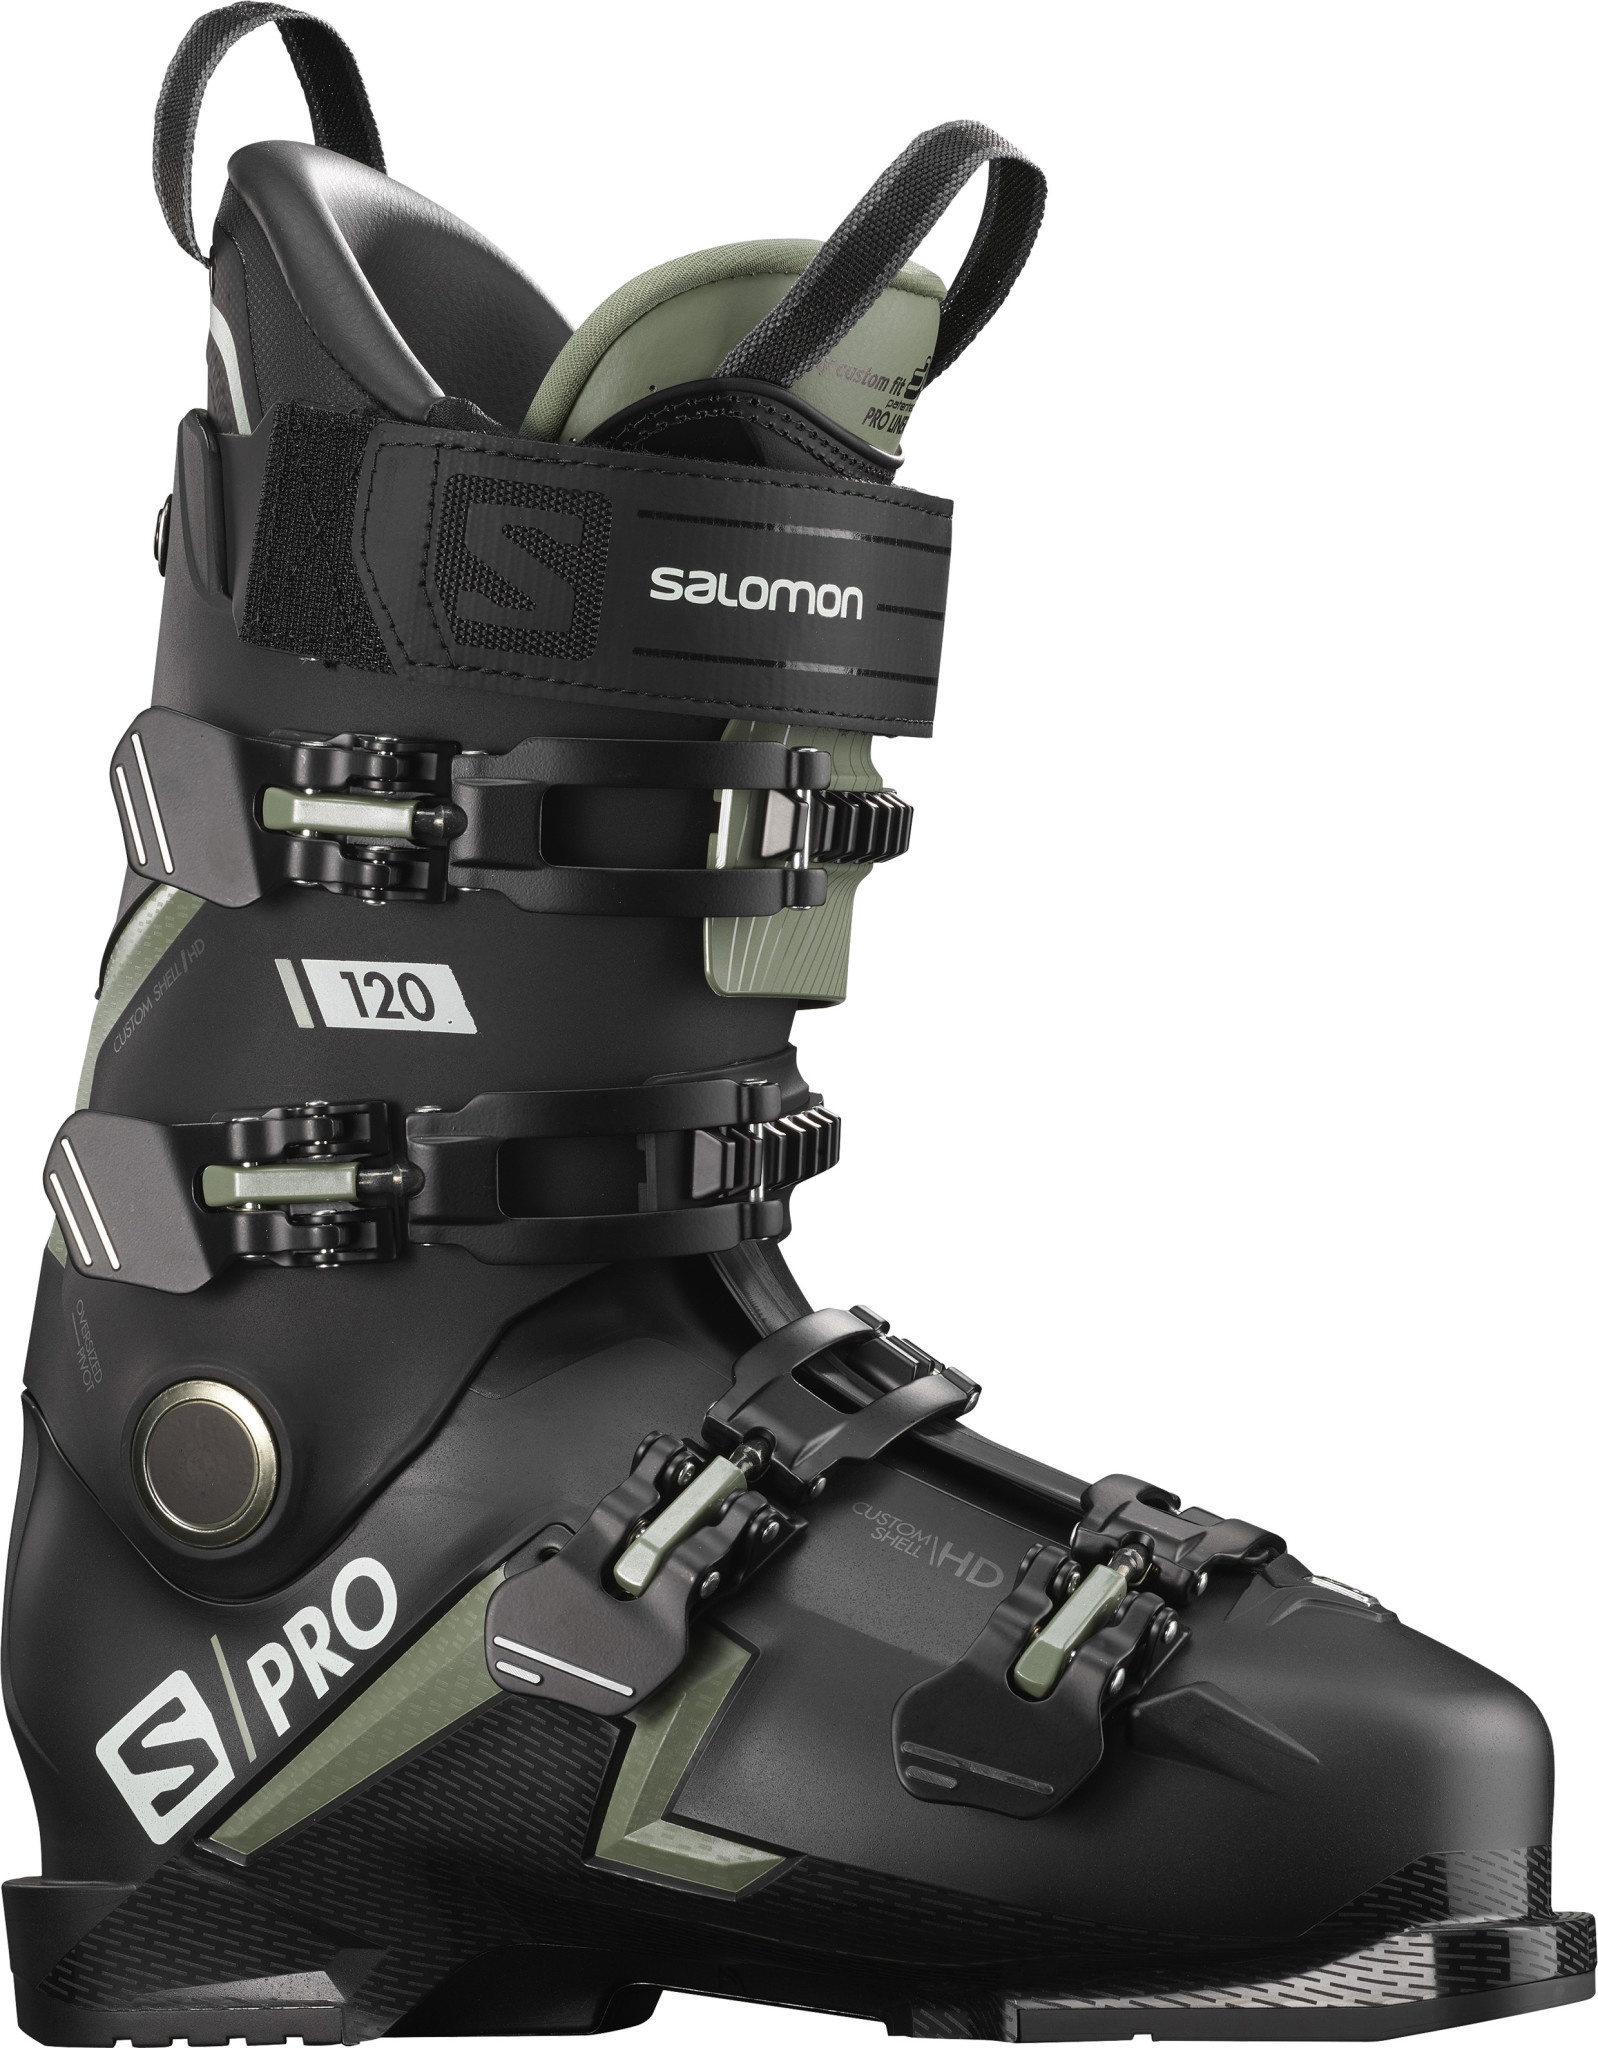 Salomon S/Pro 120-1